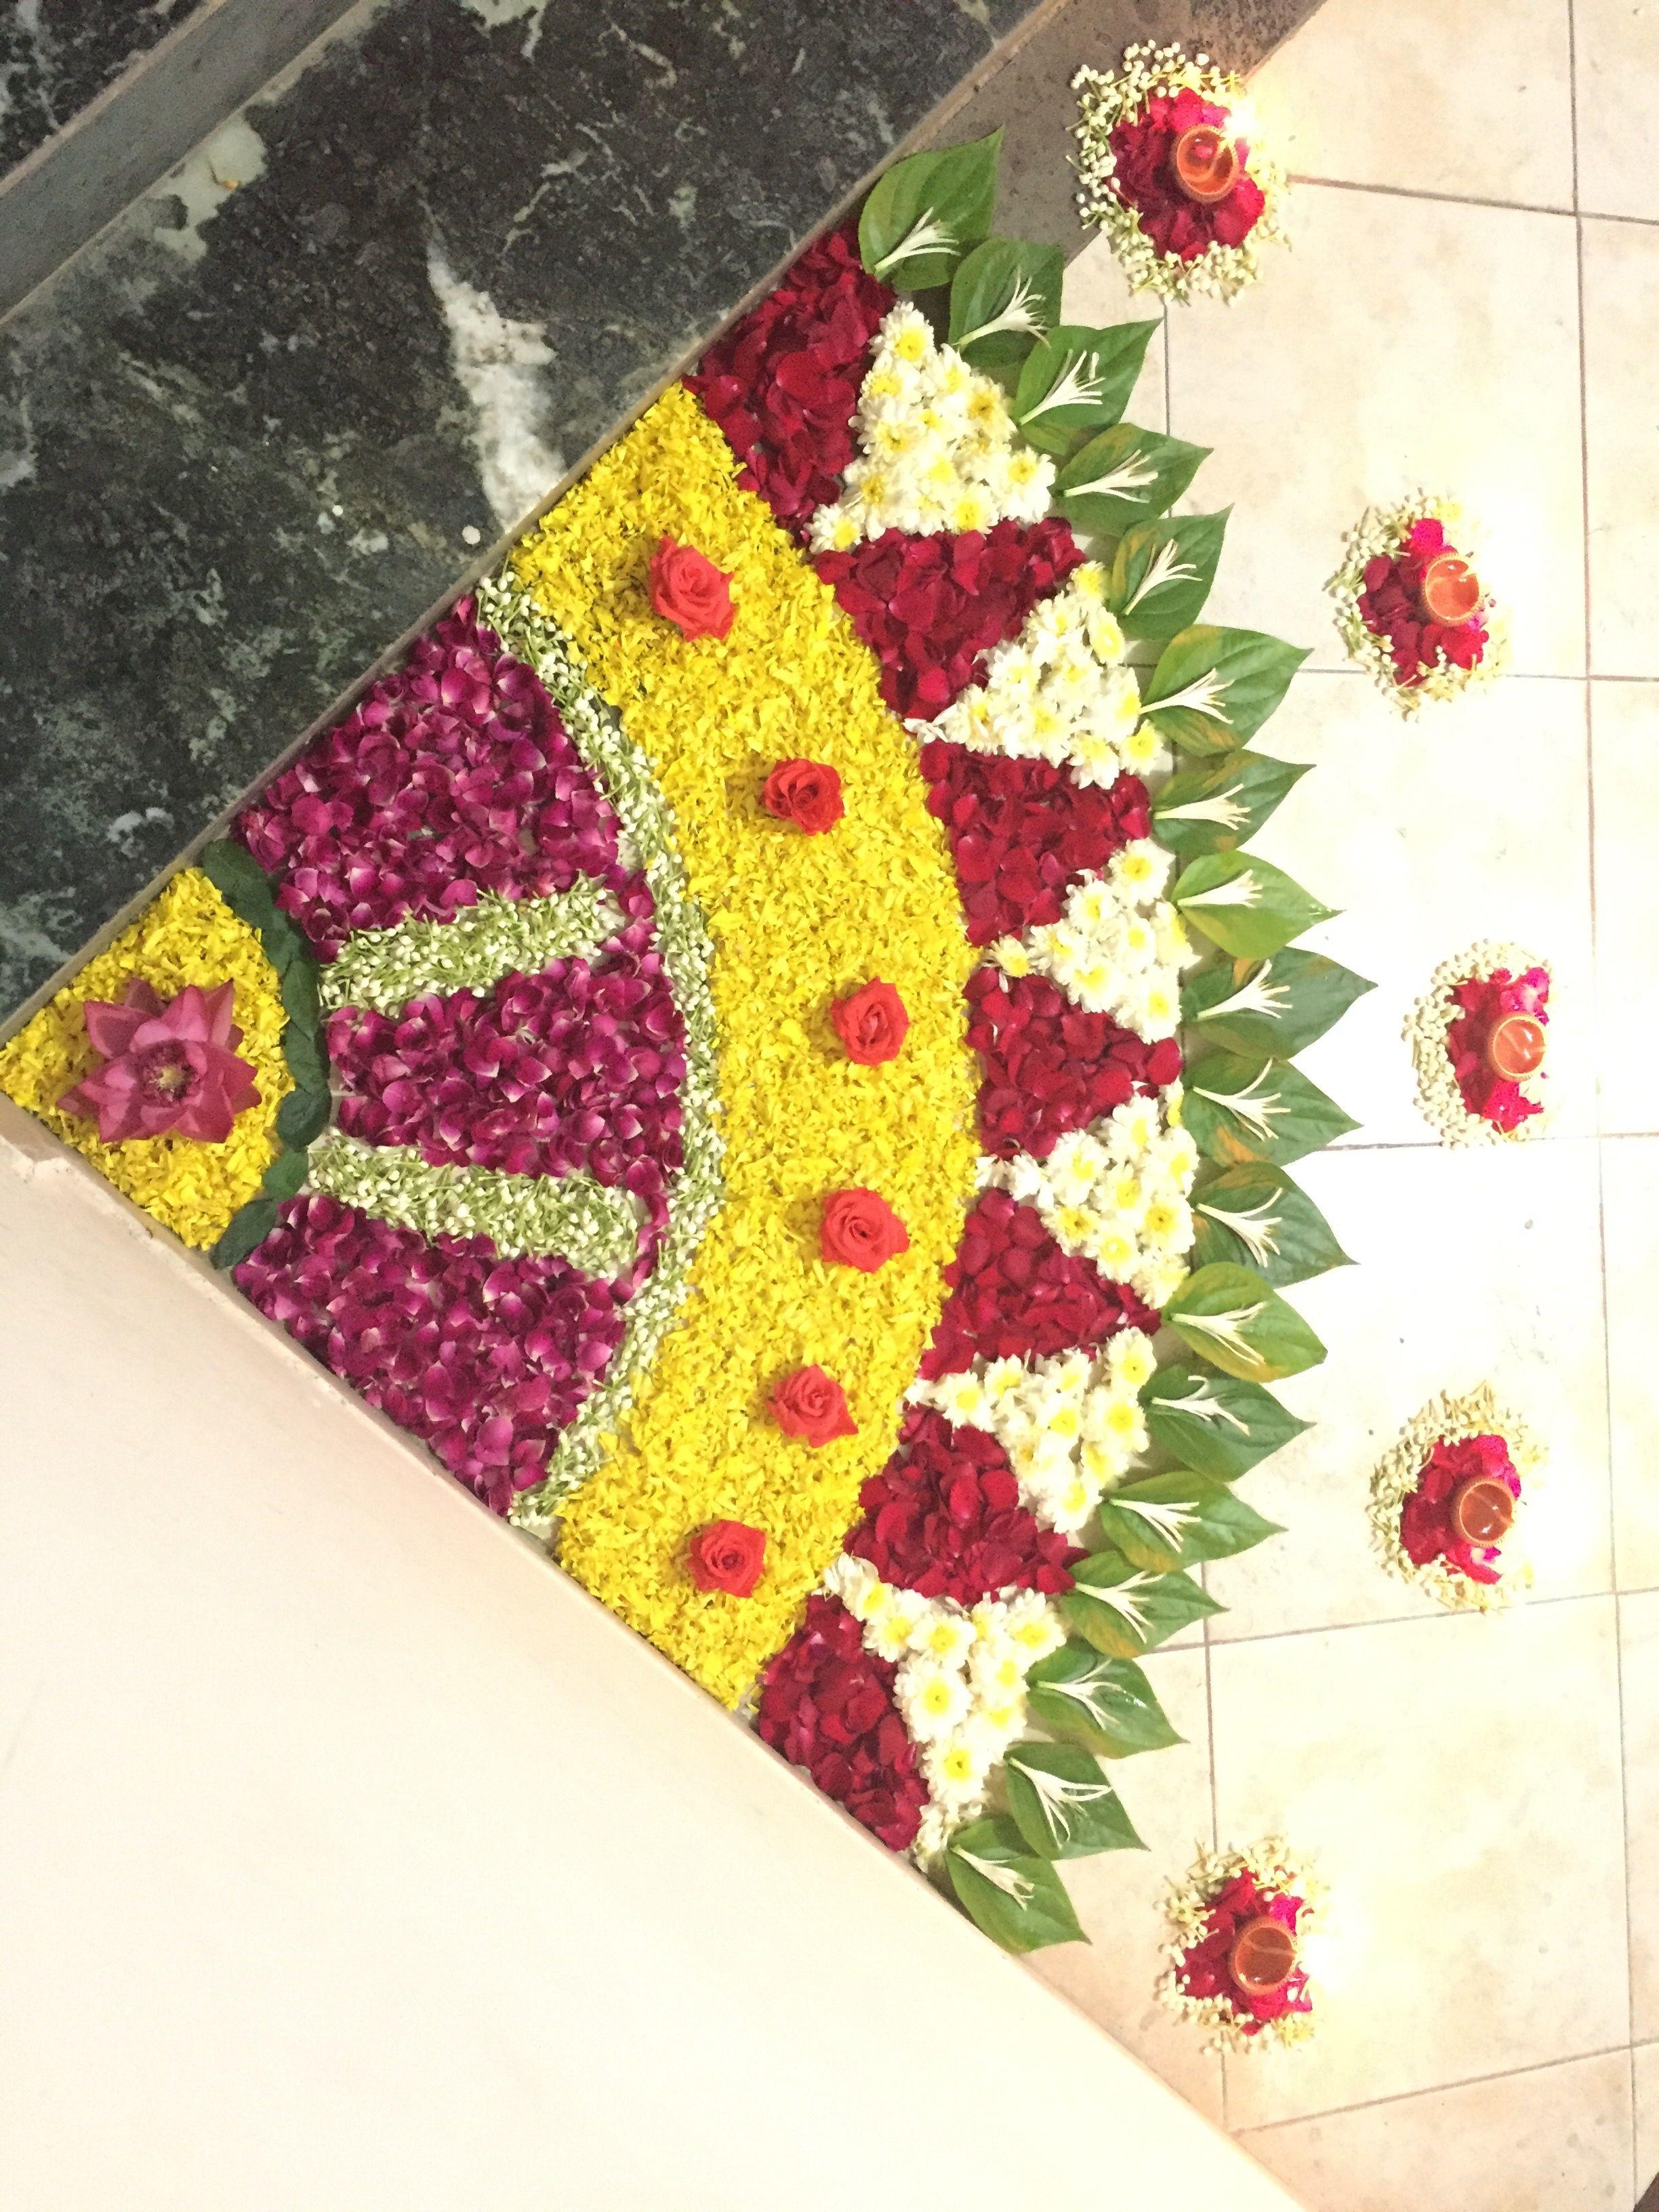 Diy House Housewarming Flower Rangoli Floor Decoration Using Flower Petals Leaves Rangoli Designs Flower Flower Rangoli Rangoli Designs